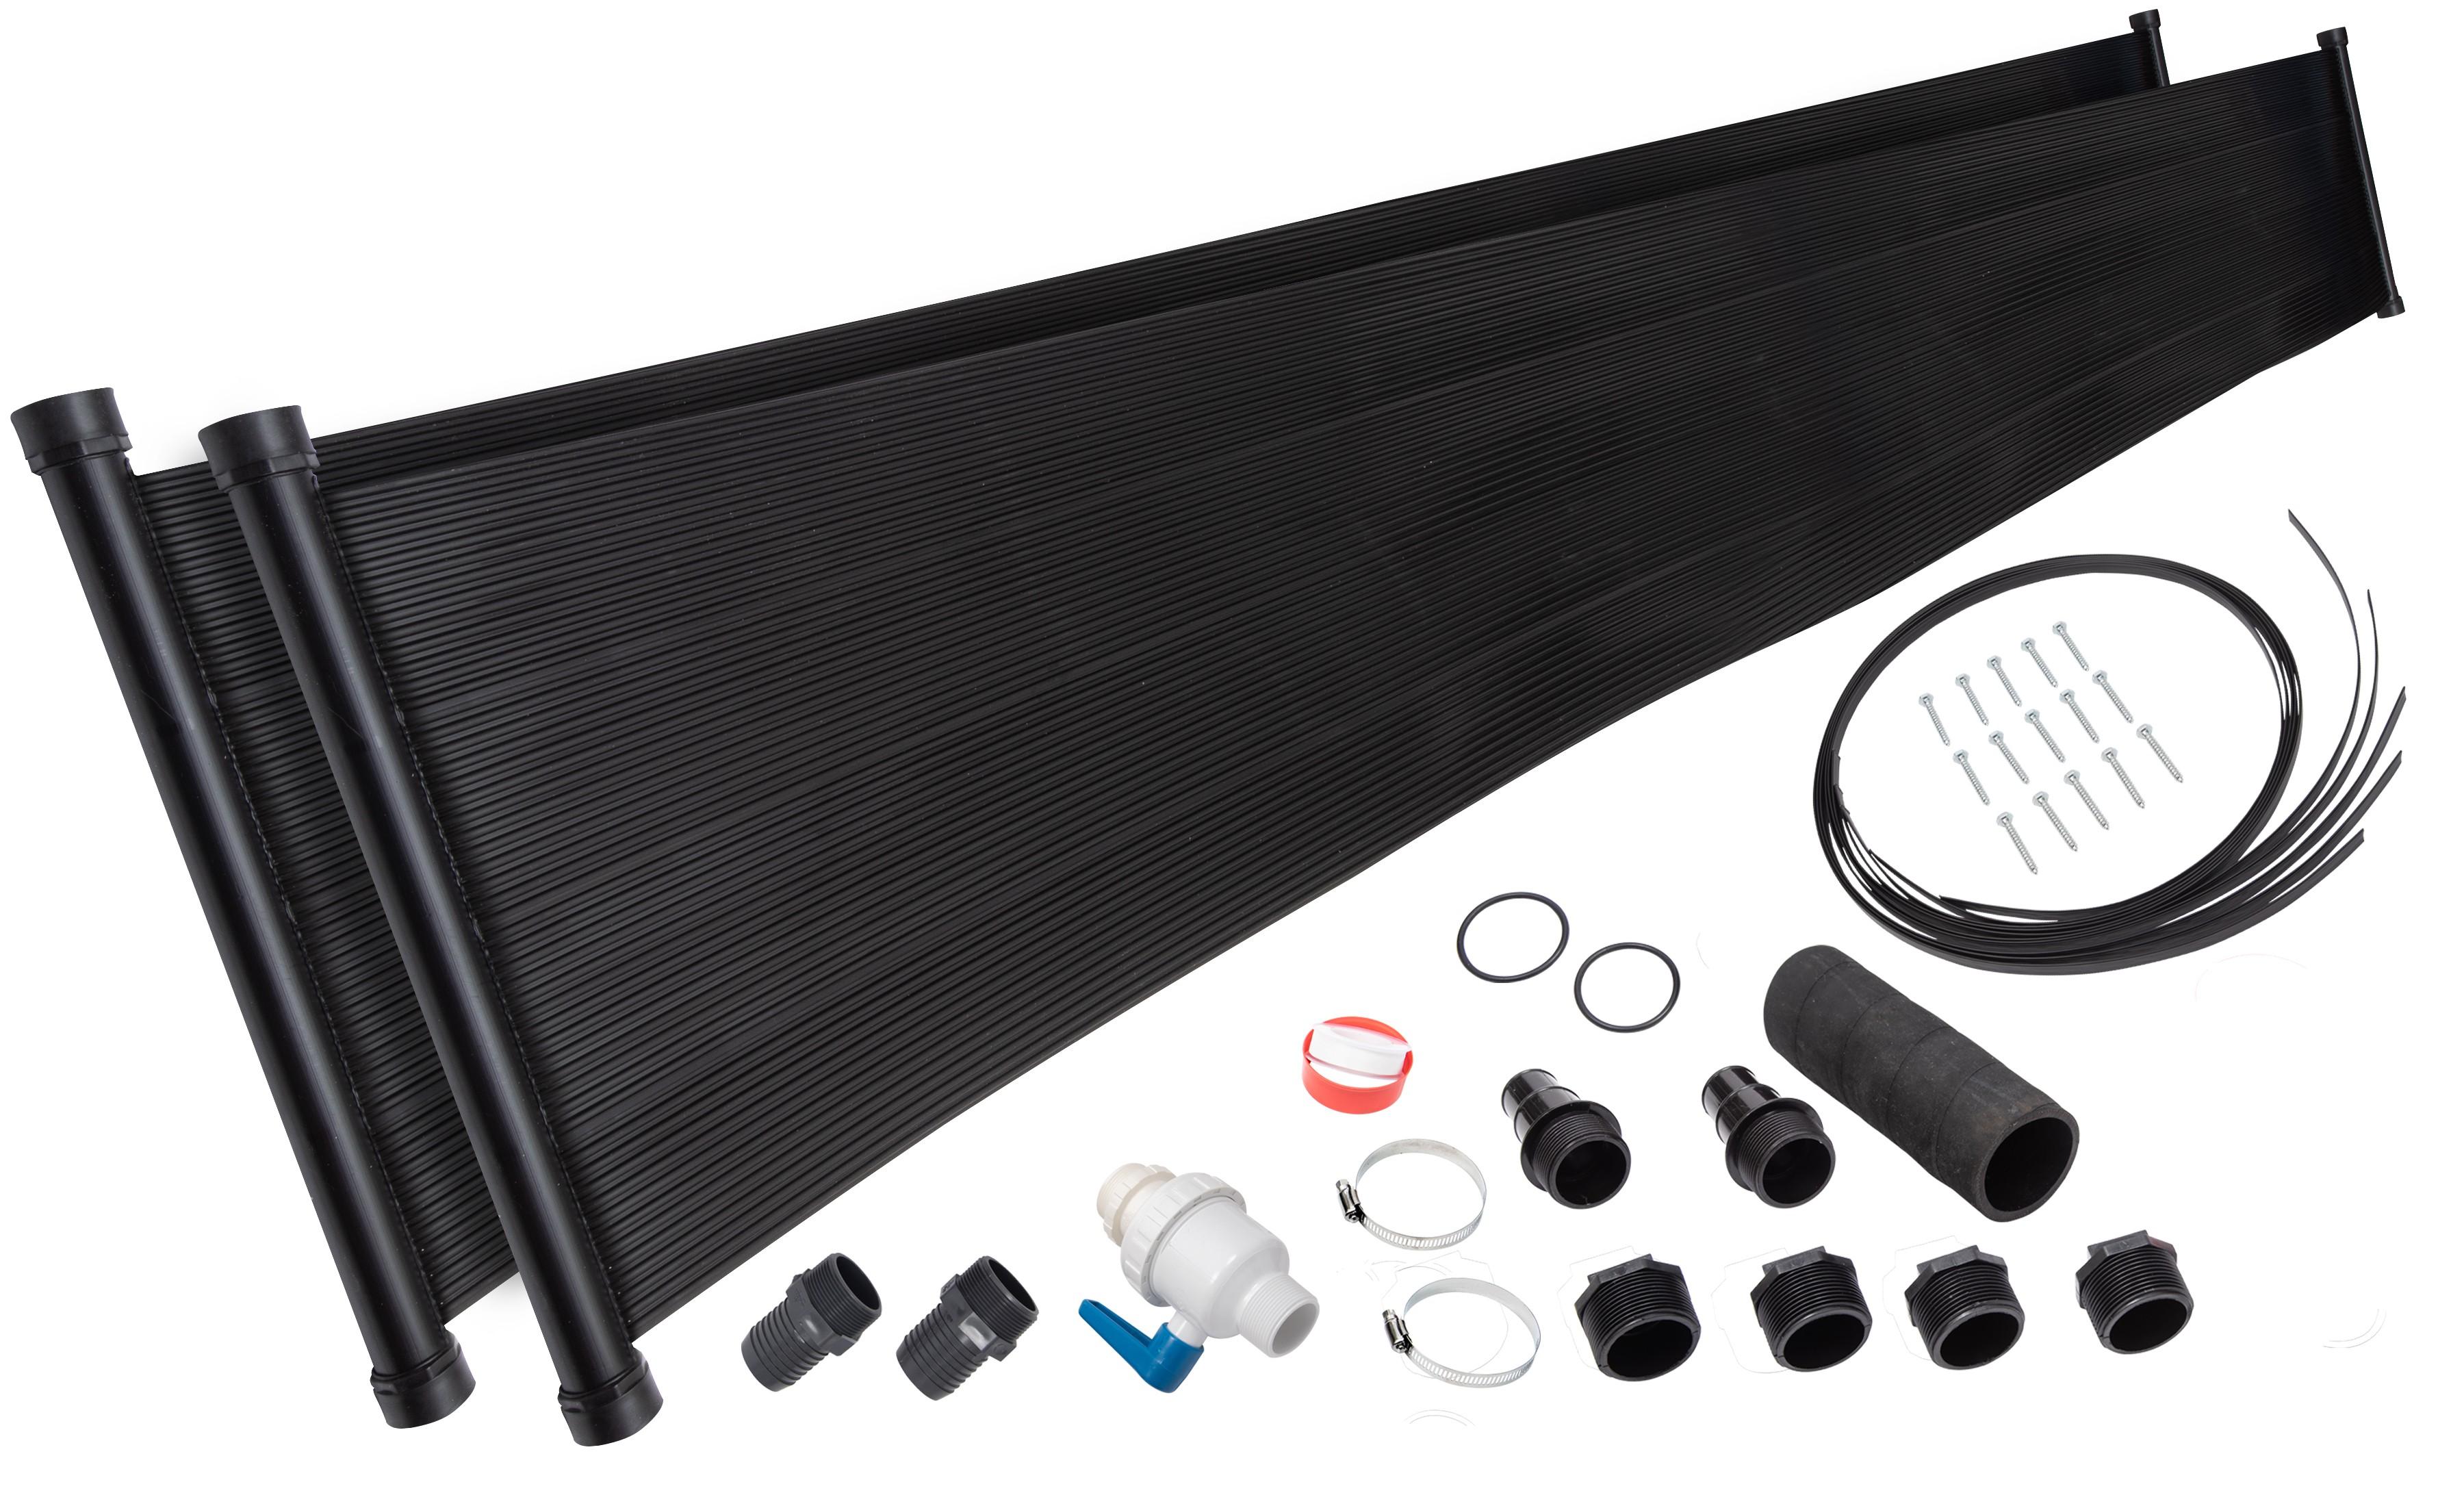 2 2 X20 Sunquest Solar Pool Heater W Integrated Valve